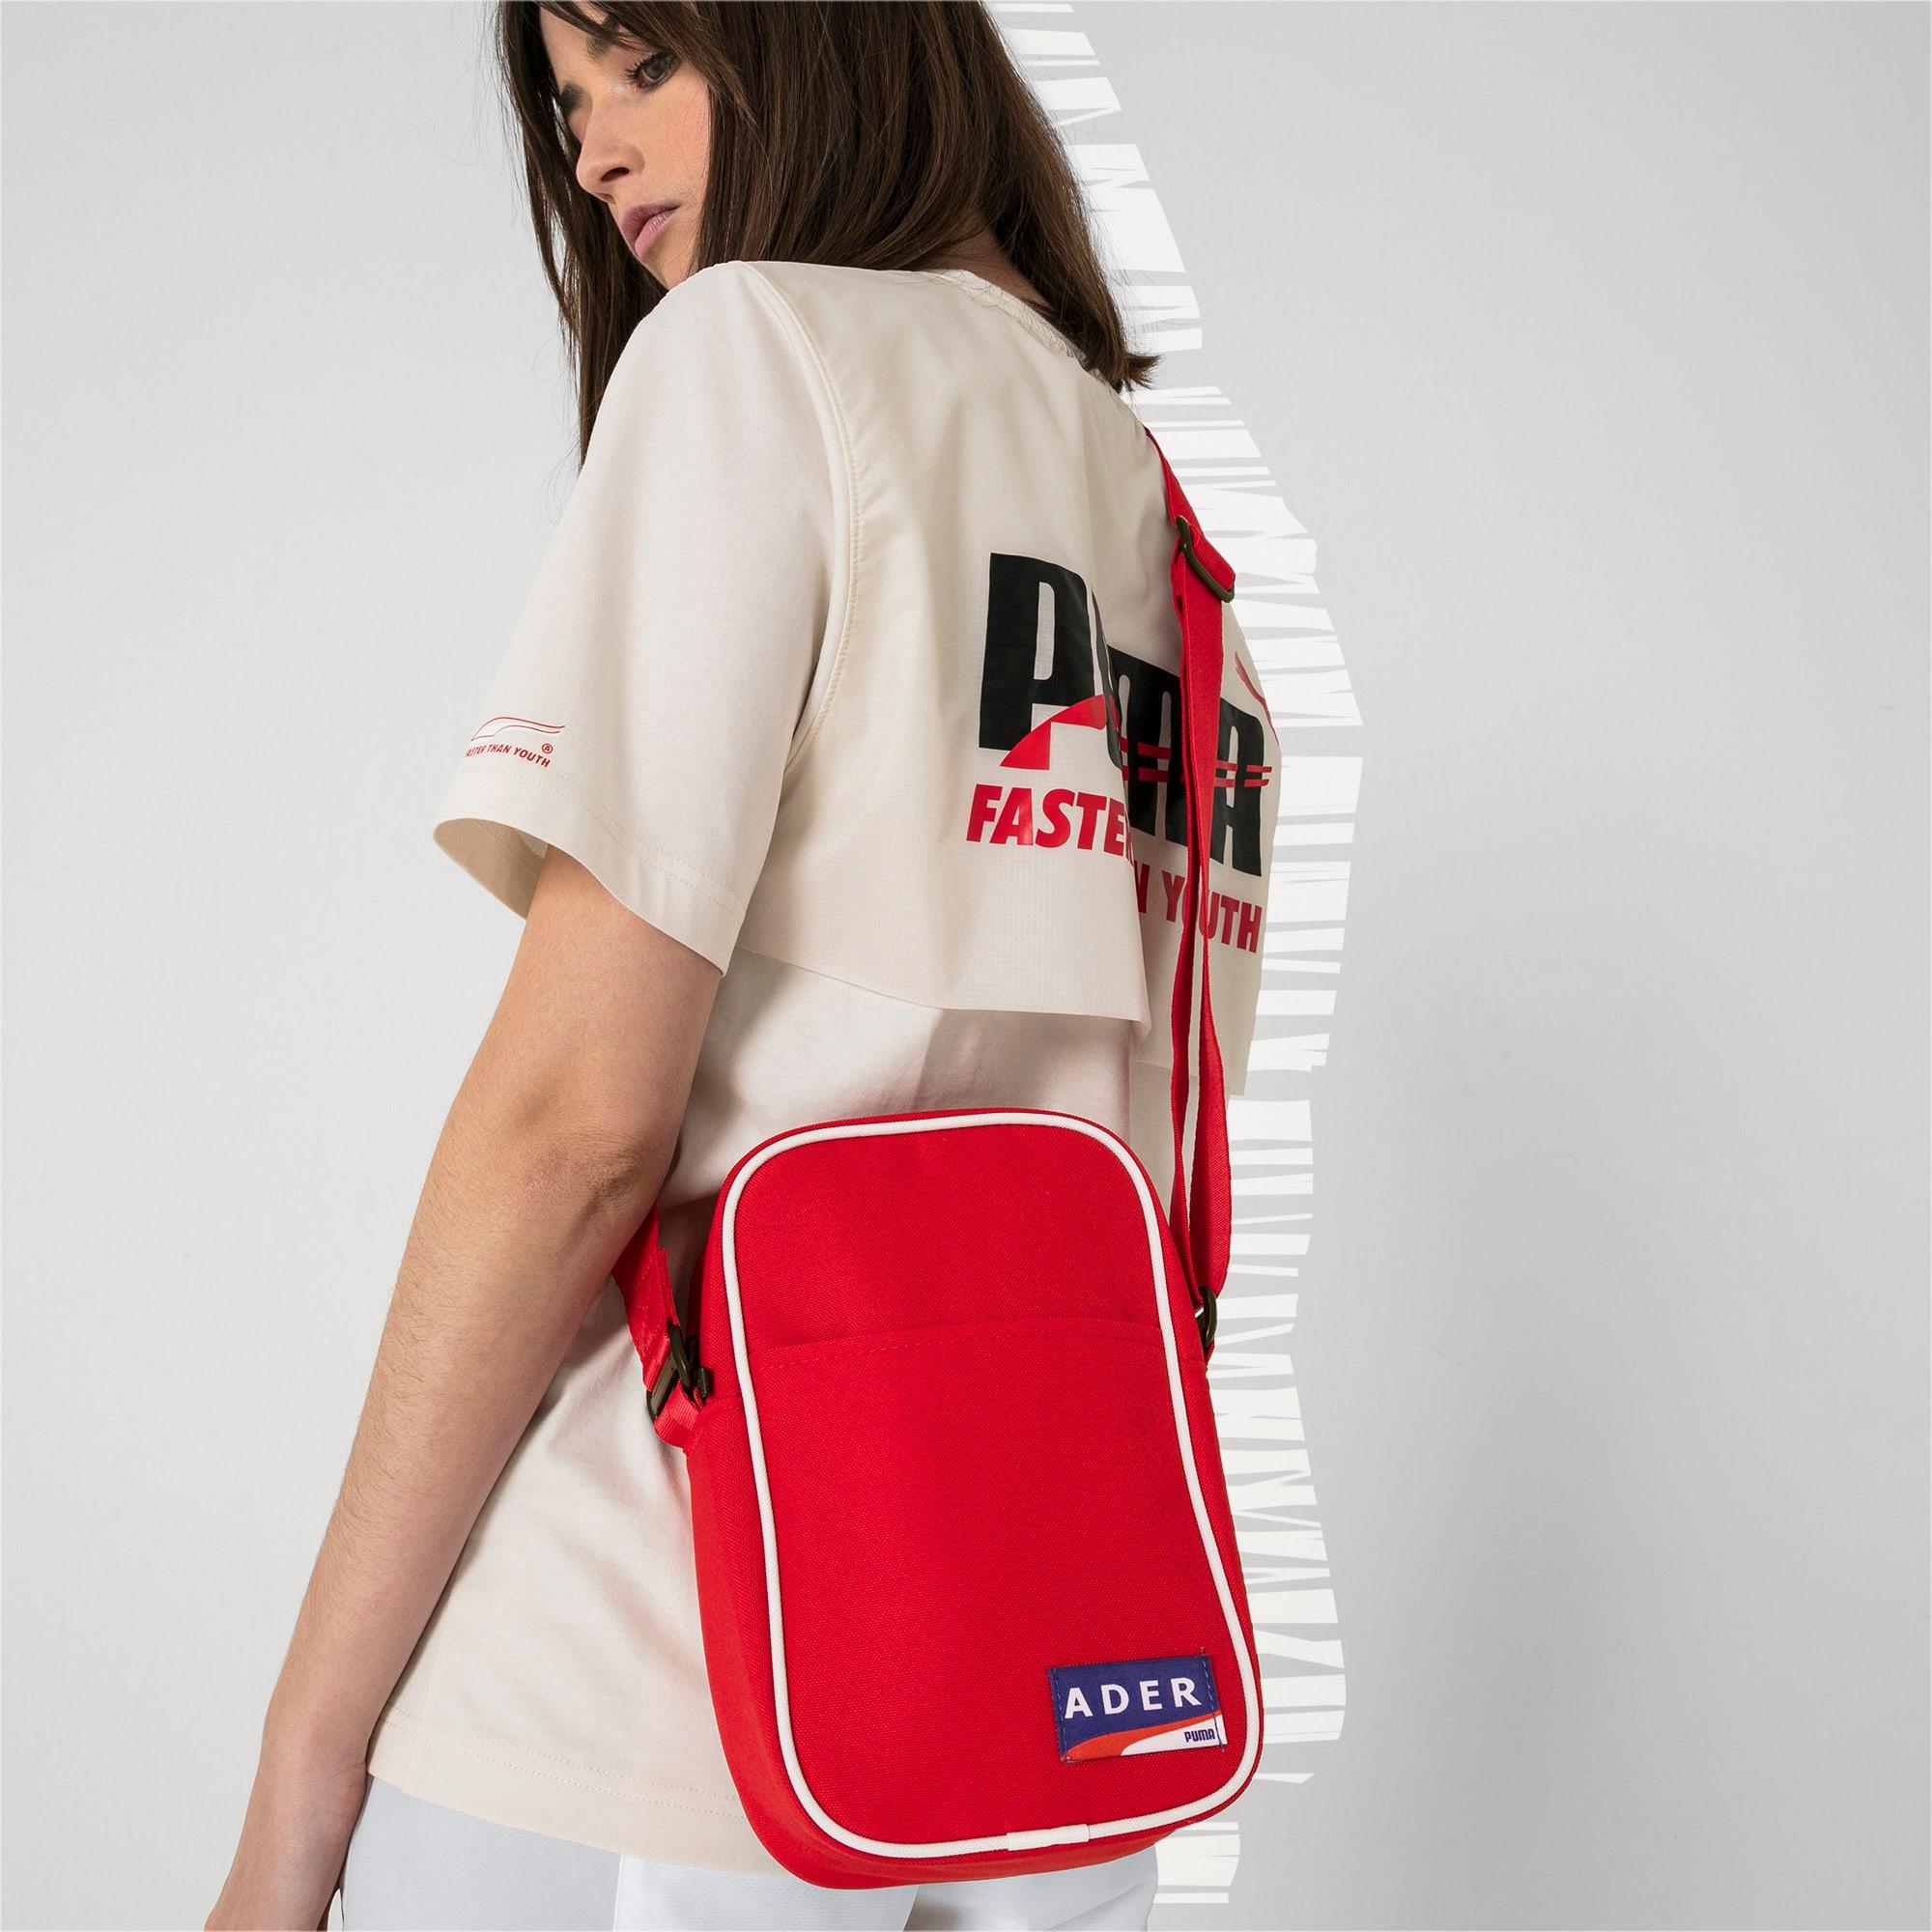 Thumbnail 5 of PUMA x ADER ERROR Portable Bag, Puma Red, medium